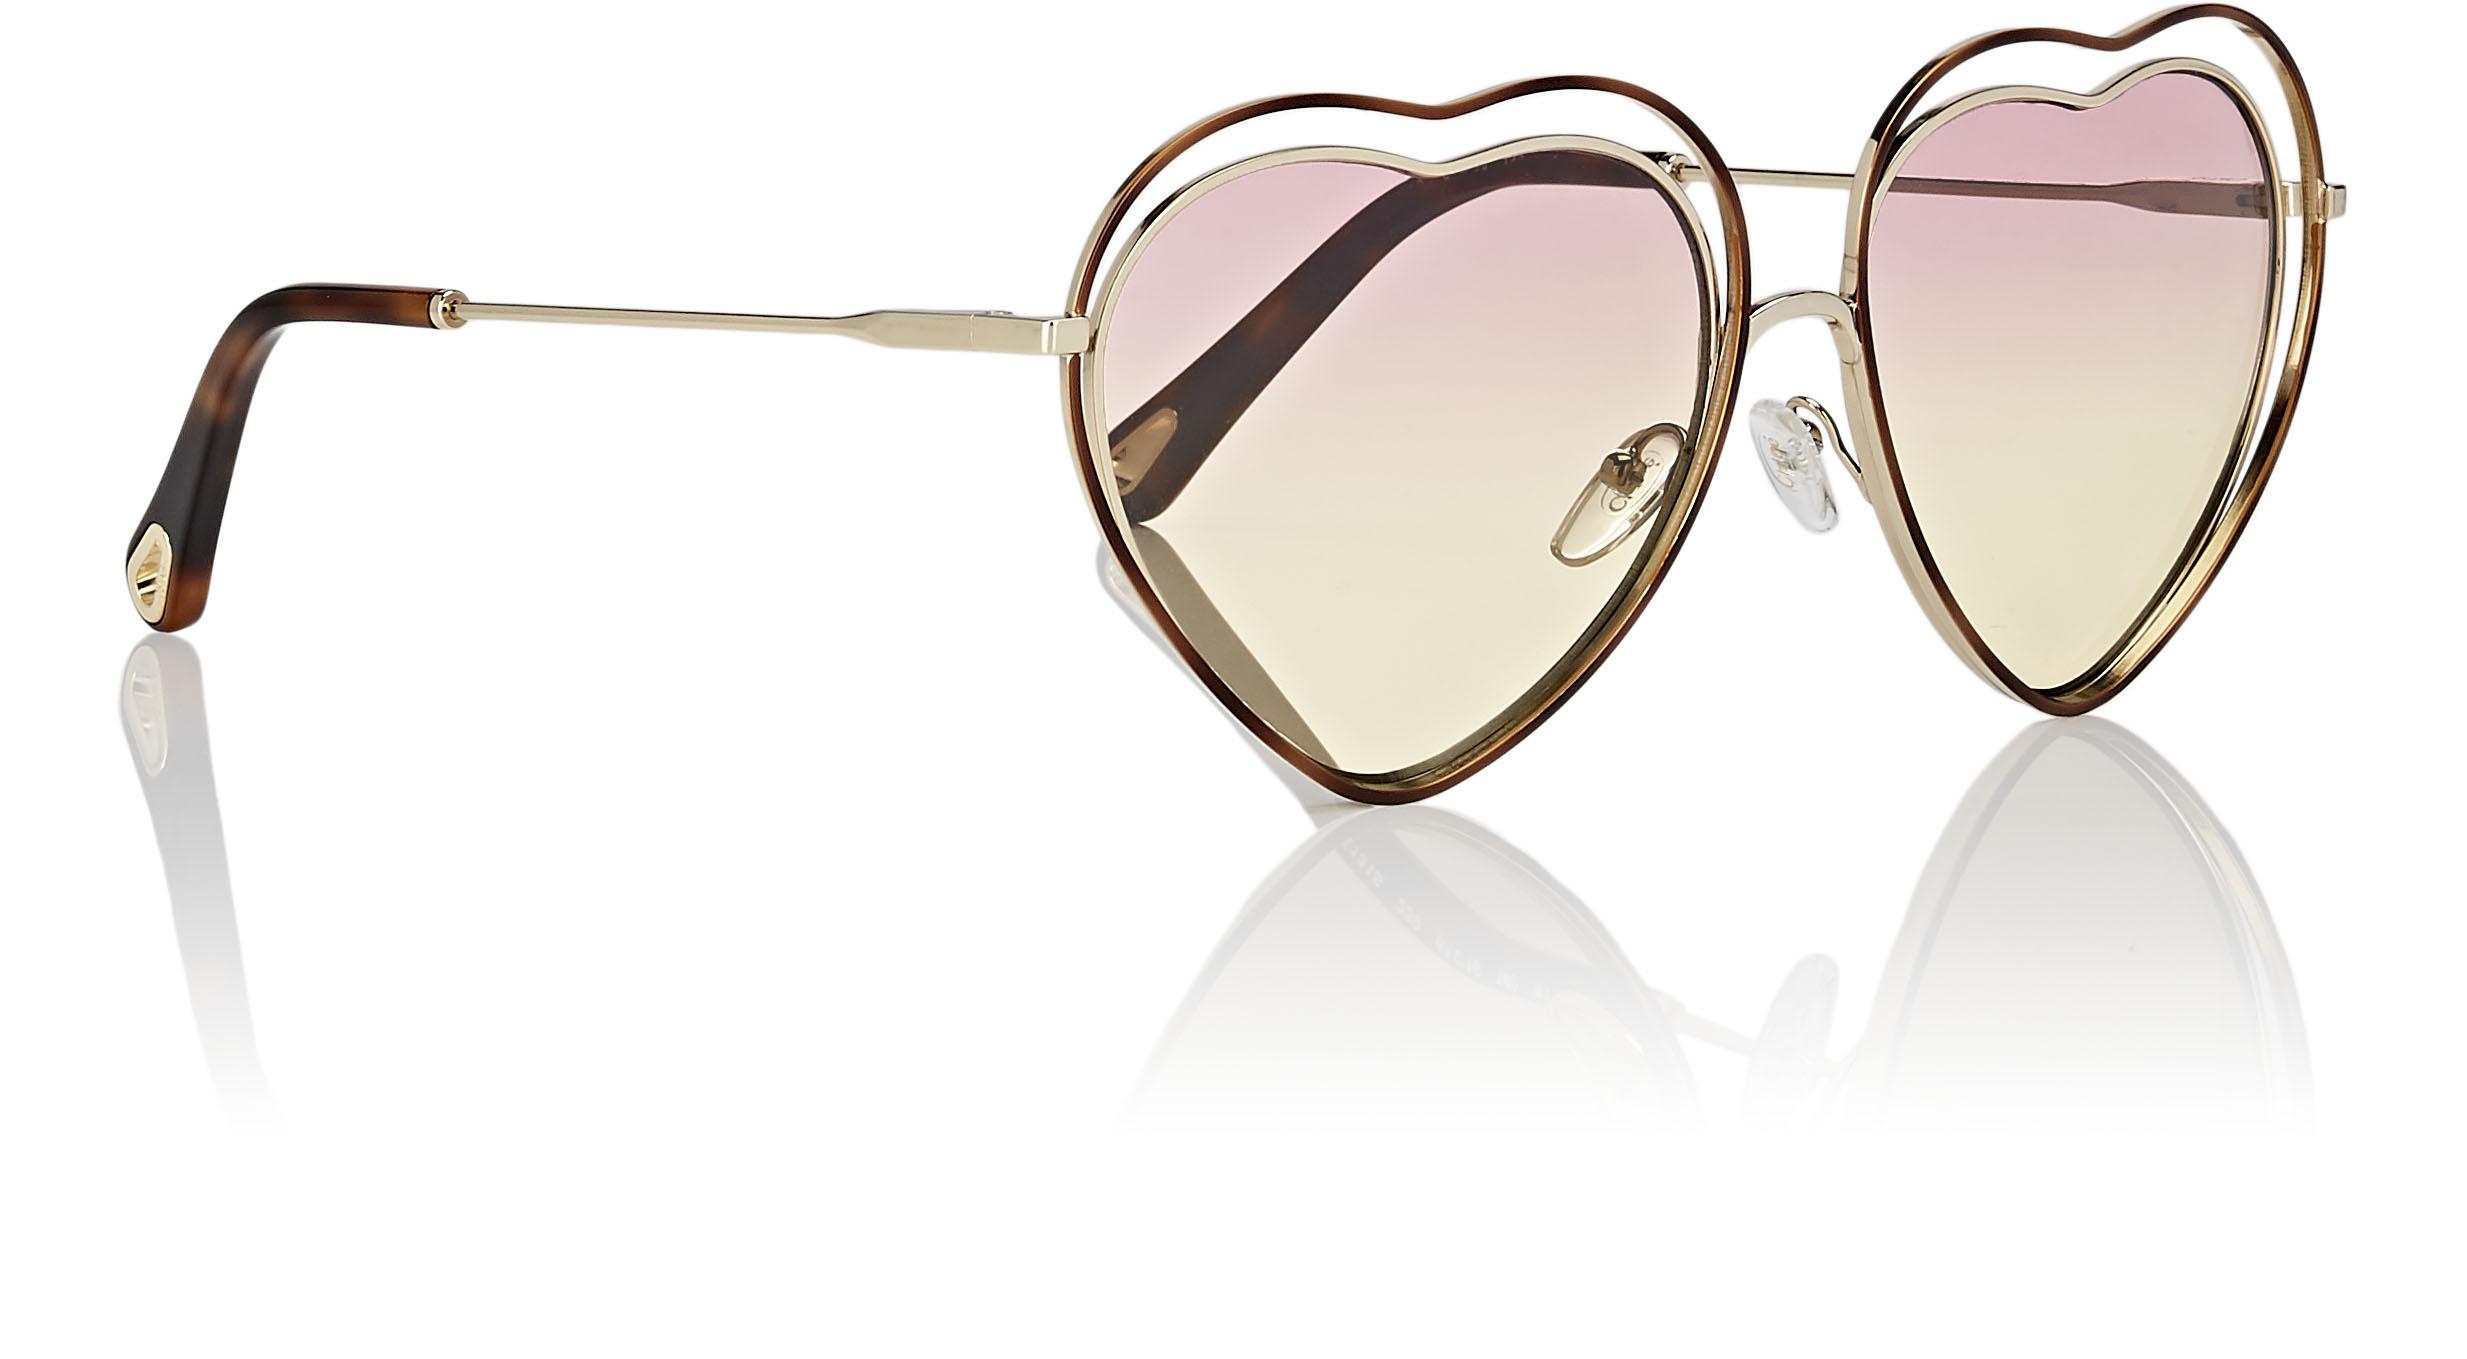 SunglassesFrontQtr.jpg